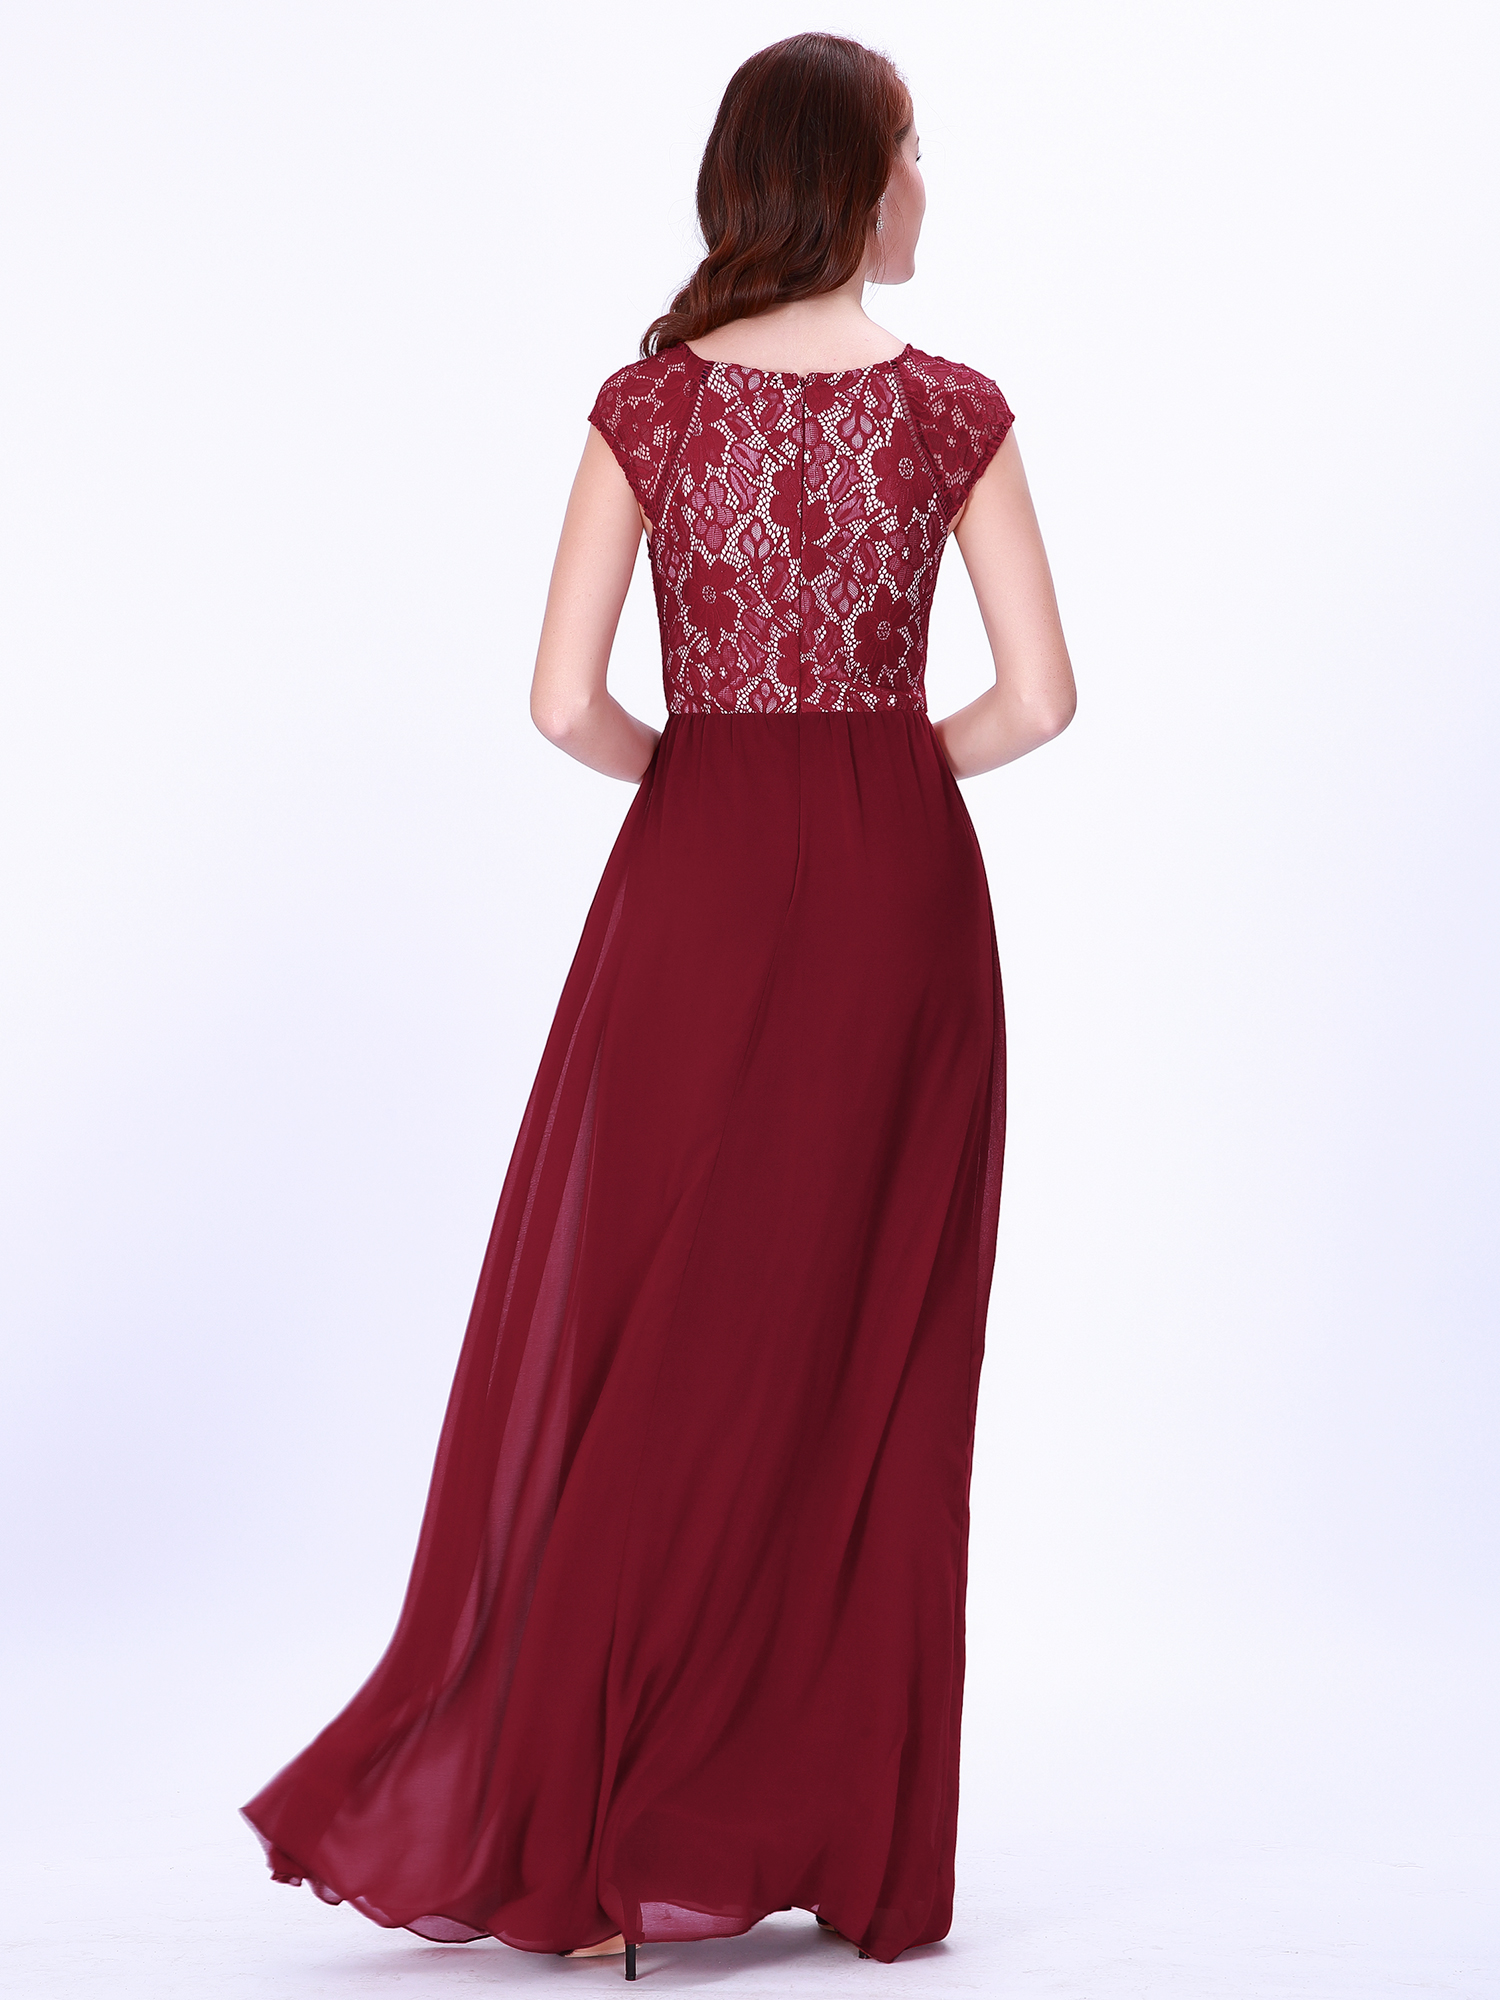 b6ca3961354de Ever-pretty Long Burgundy Formal Evening Prom Gowns Sleeveless ...